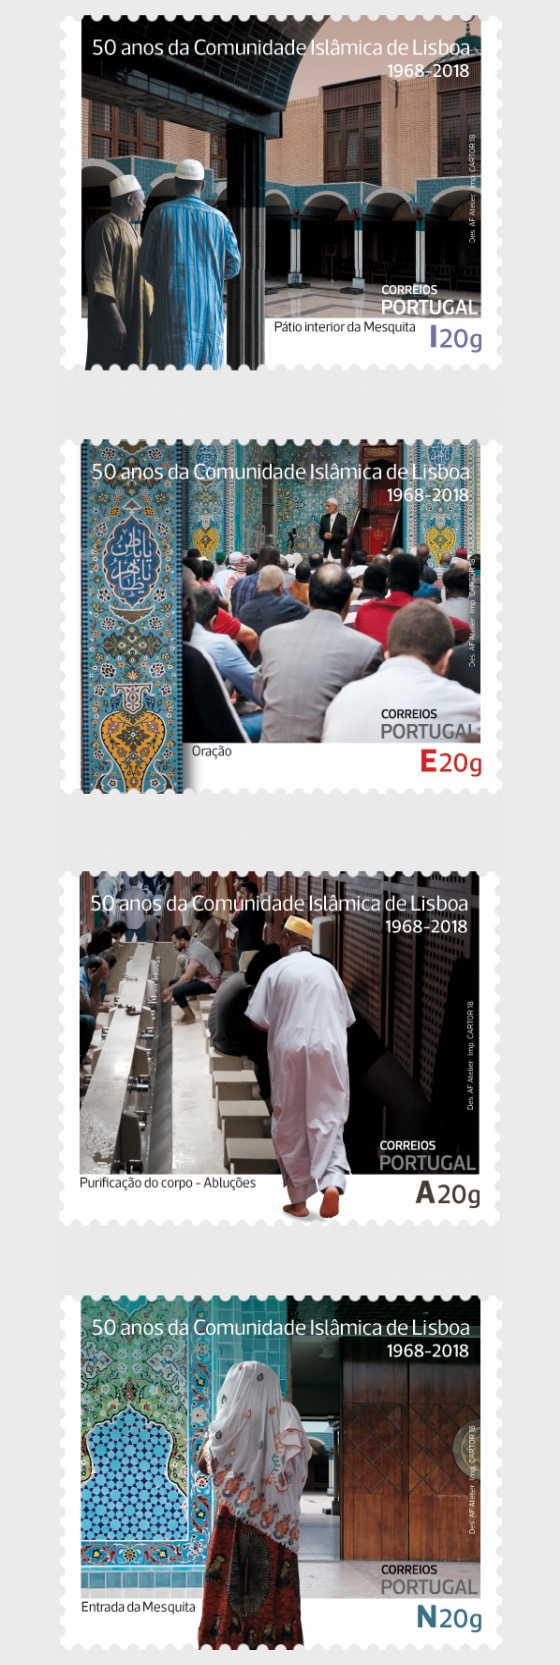 The Islamic Community of Lisbon - Set